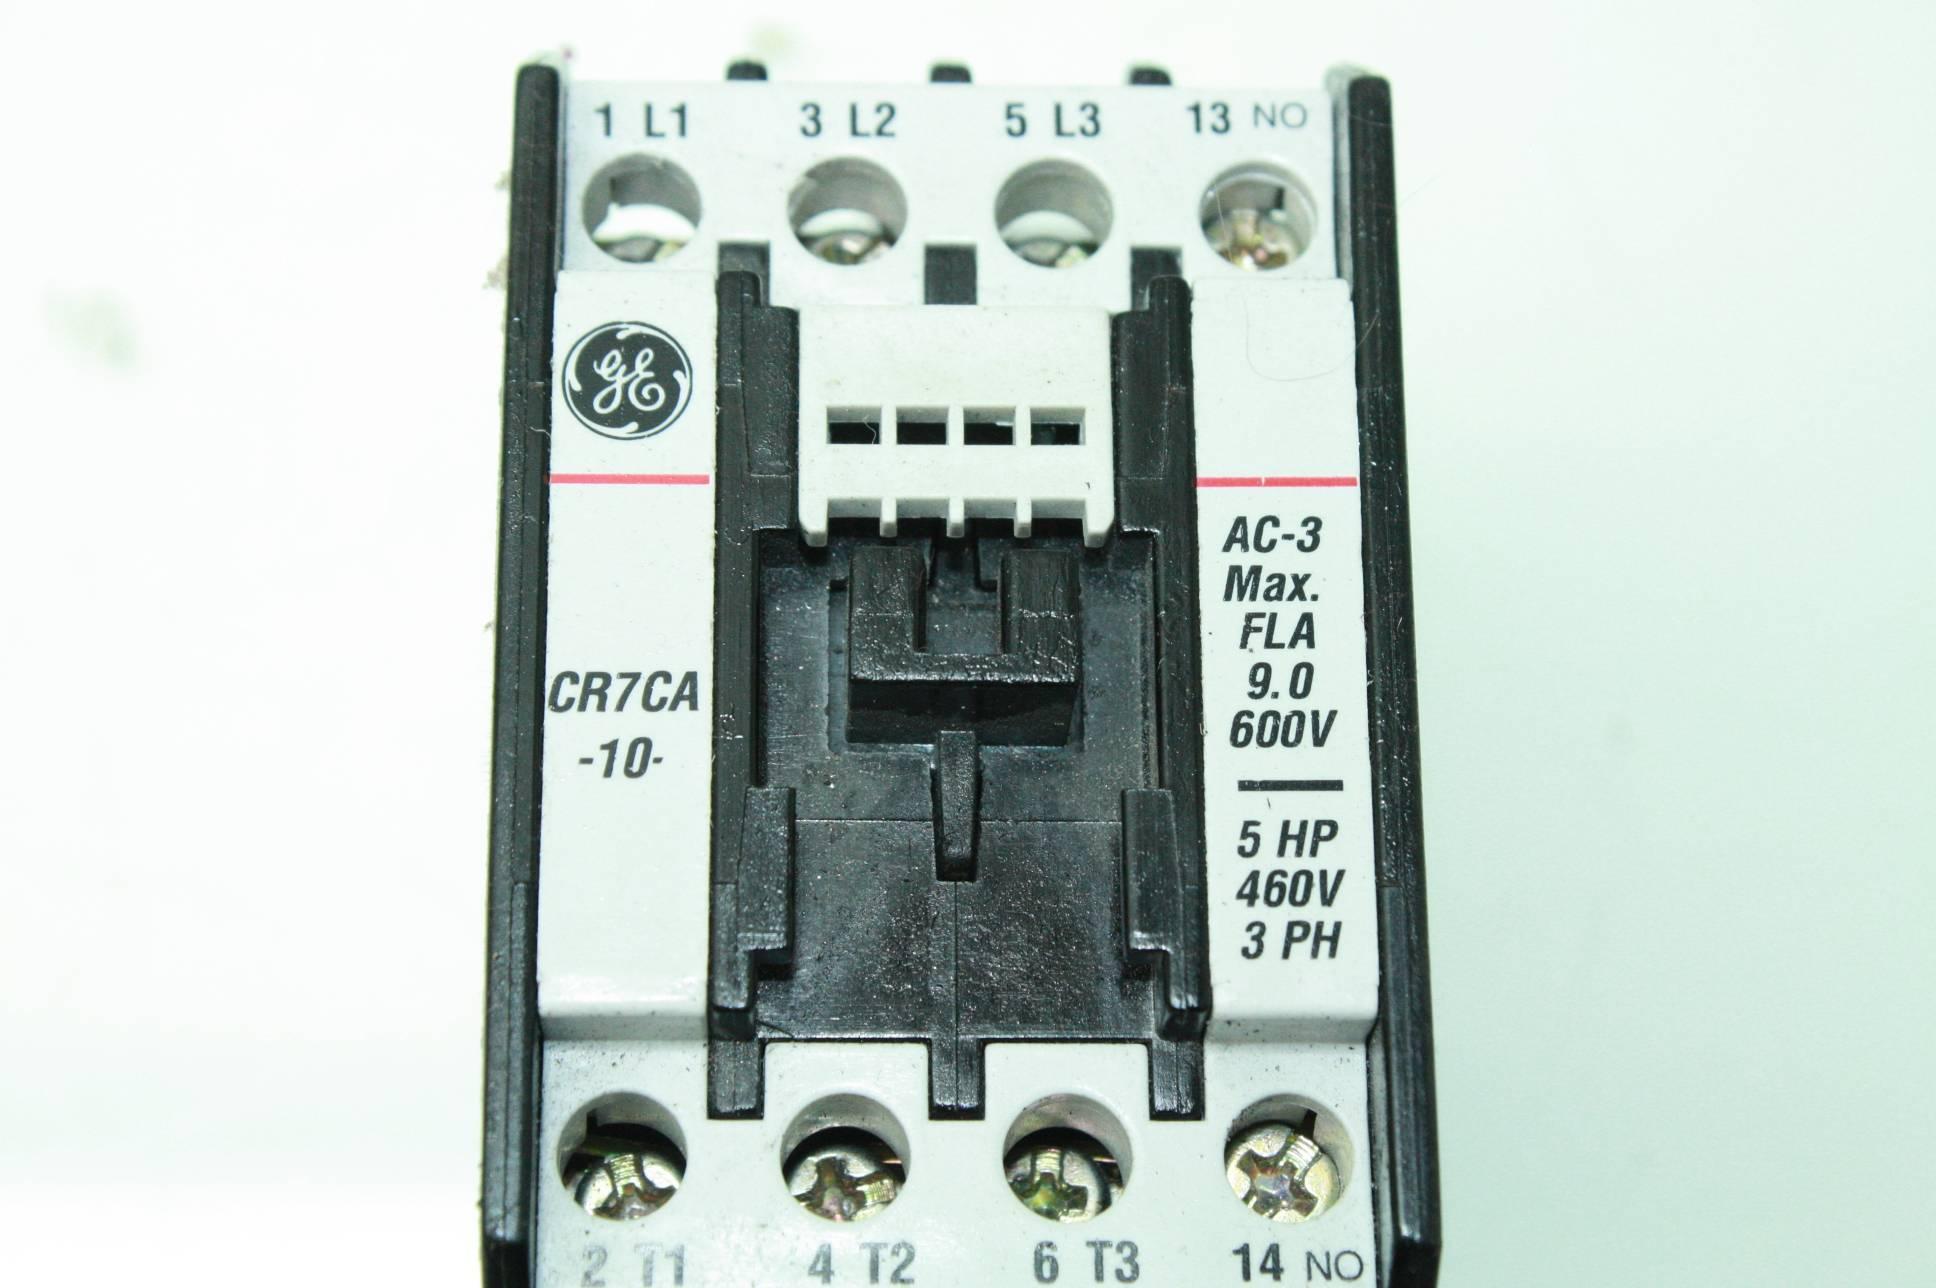 General Electric CR7CA-10 Motor Starter Relay Contactor